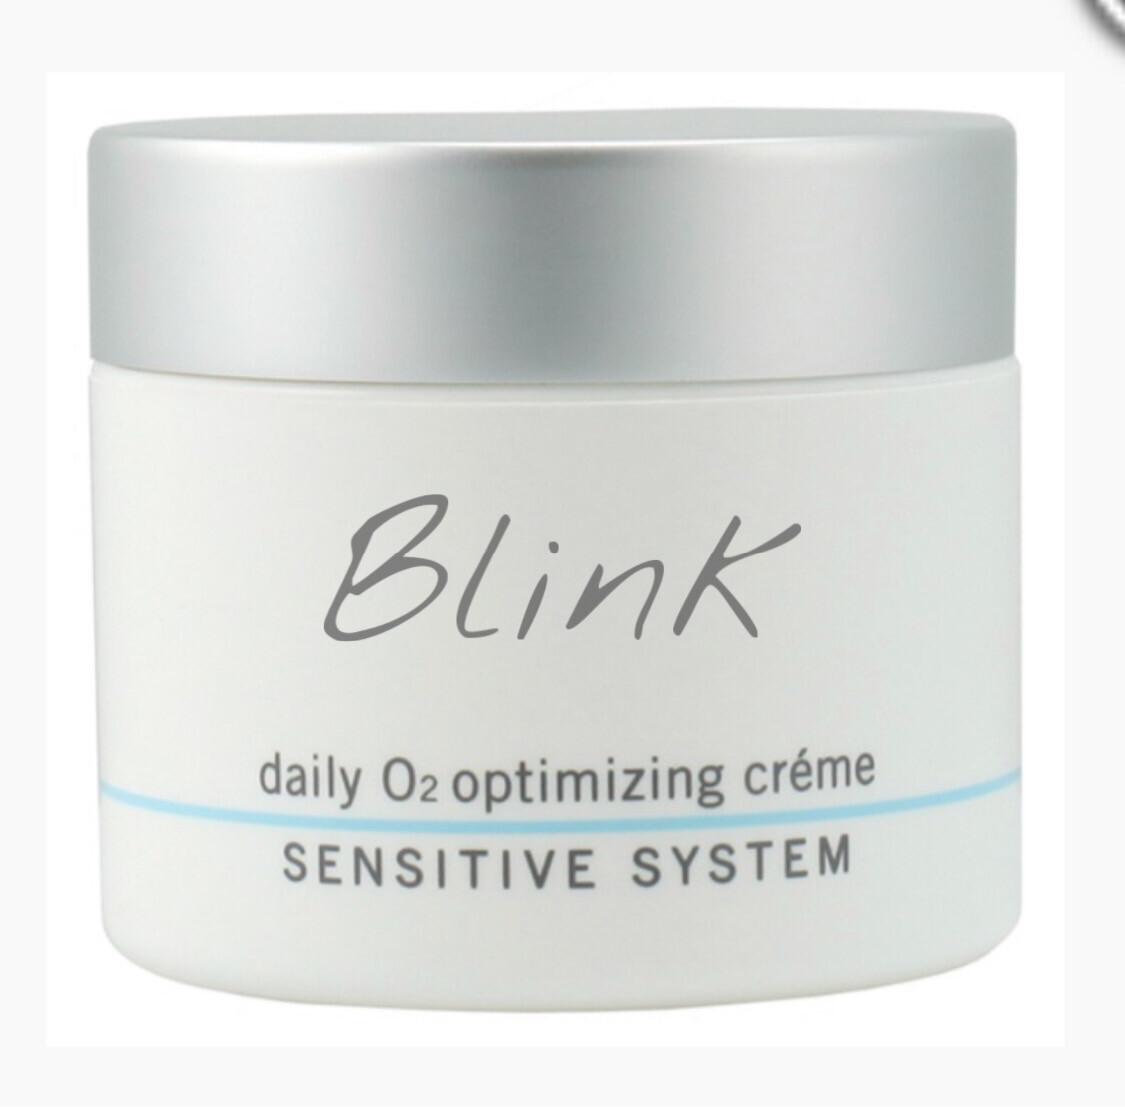 Blink Skincare Daily O2 Optimizing Creme Sensitive System